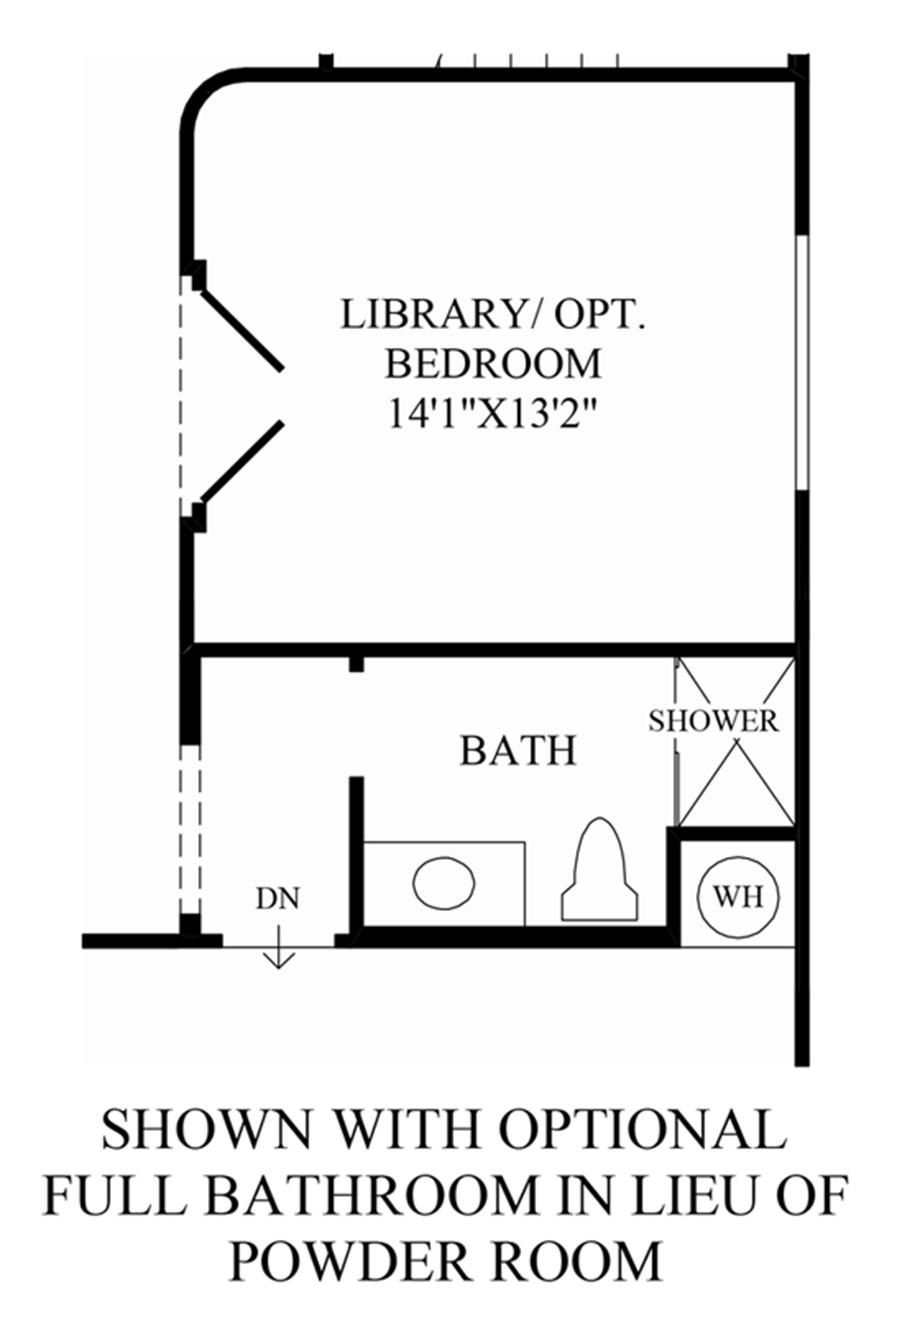 Optional Full Bathroom ILO Powder Room Floor Plan